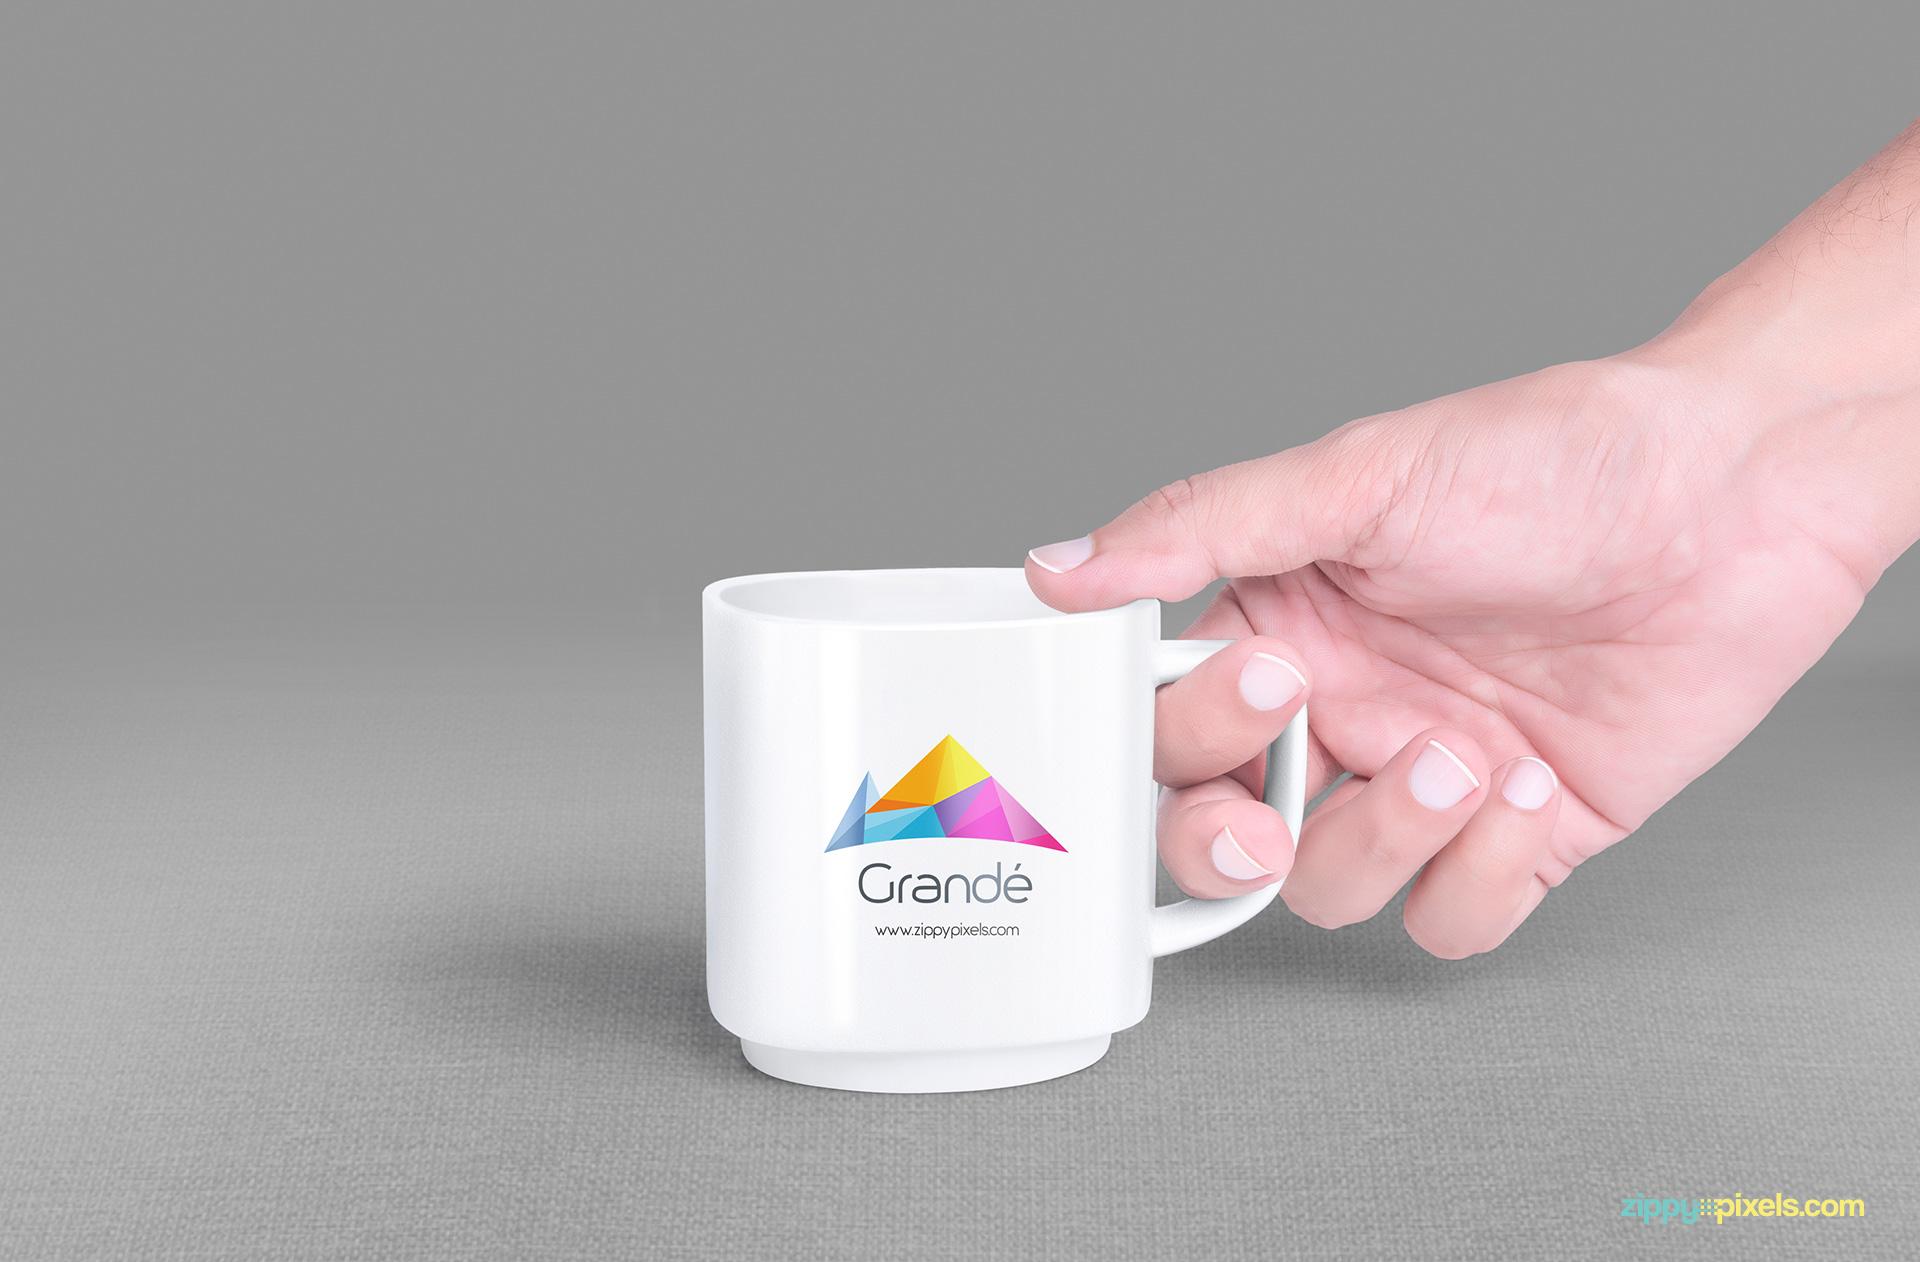 Freebie mug mockup in realistic environment.